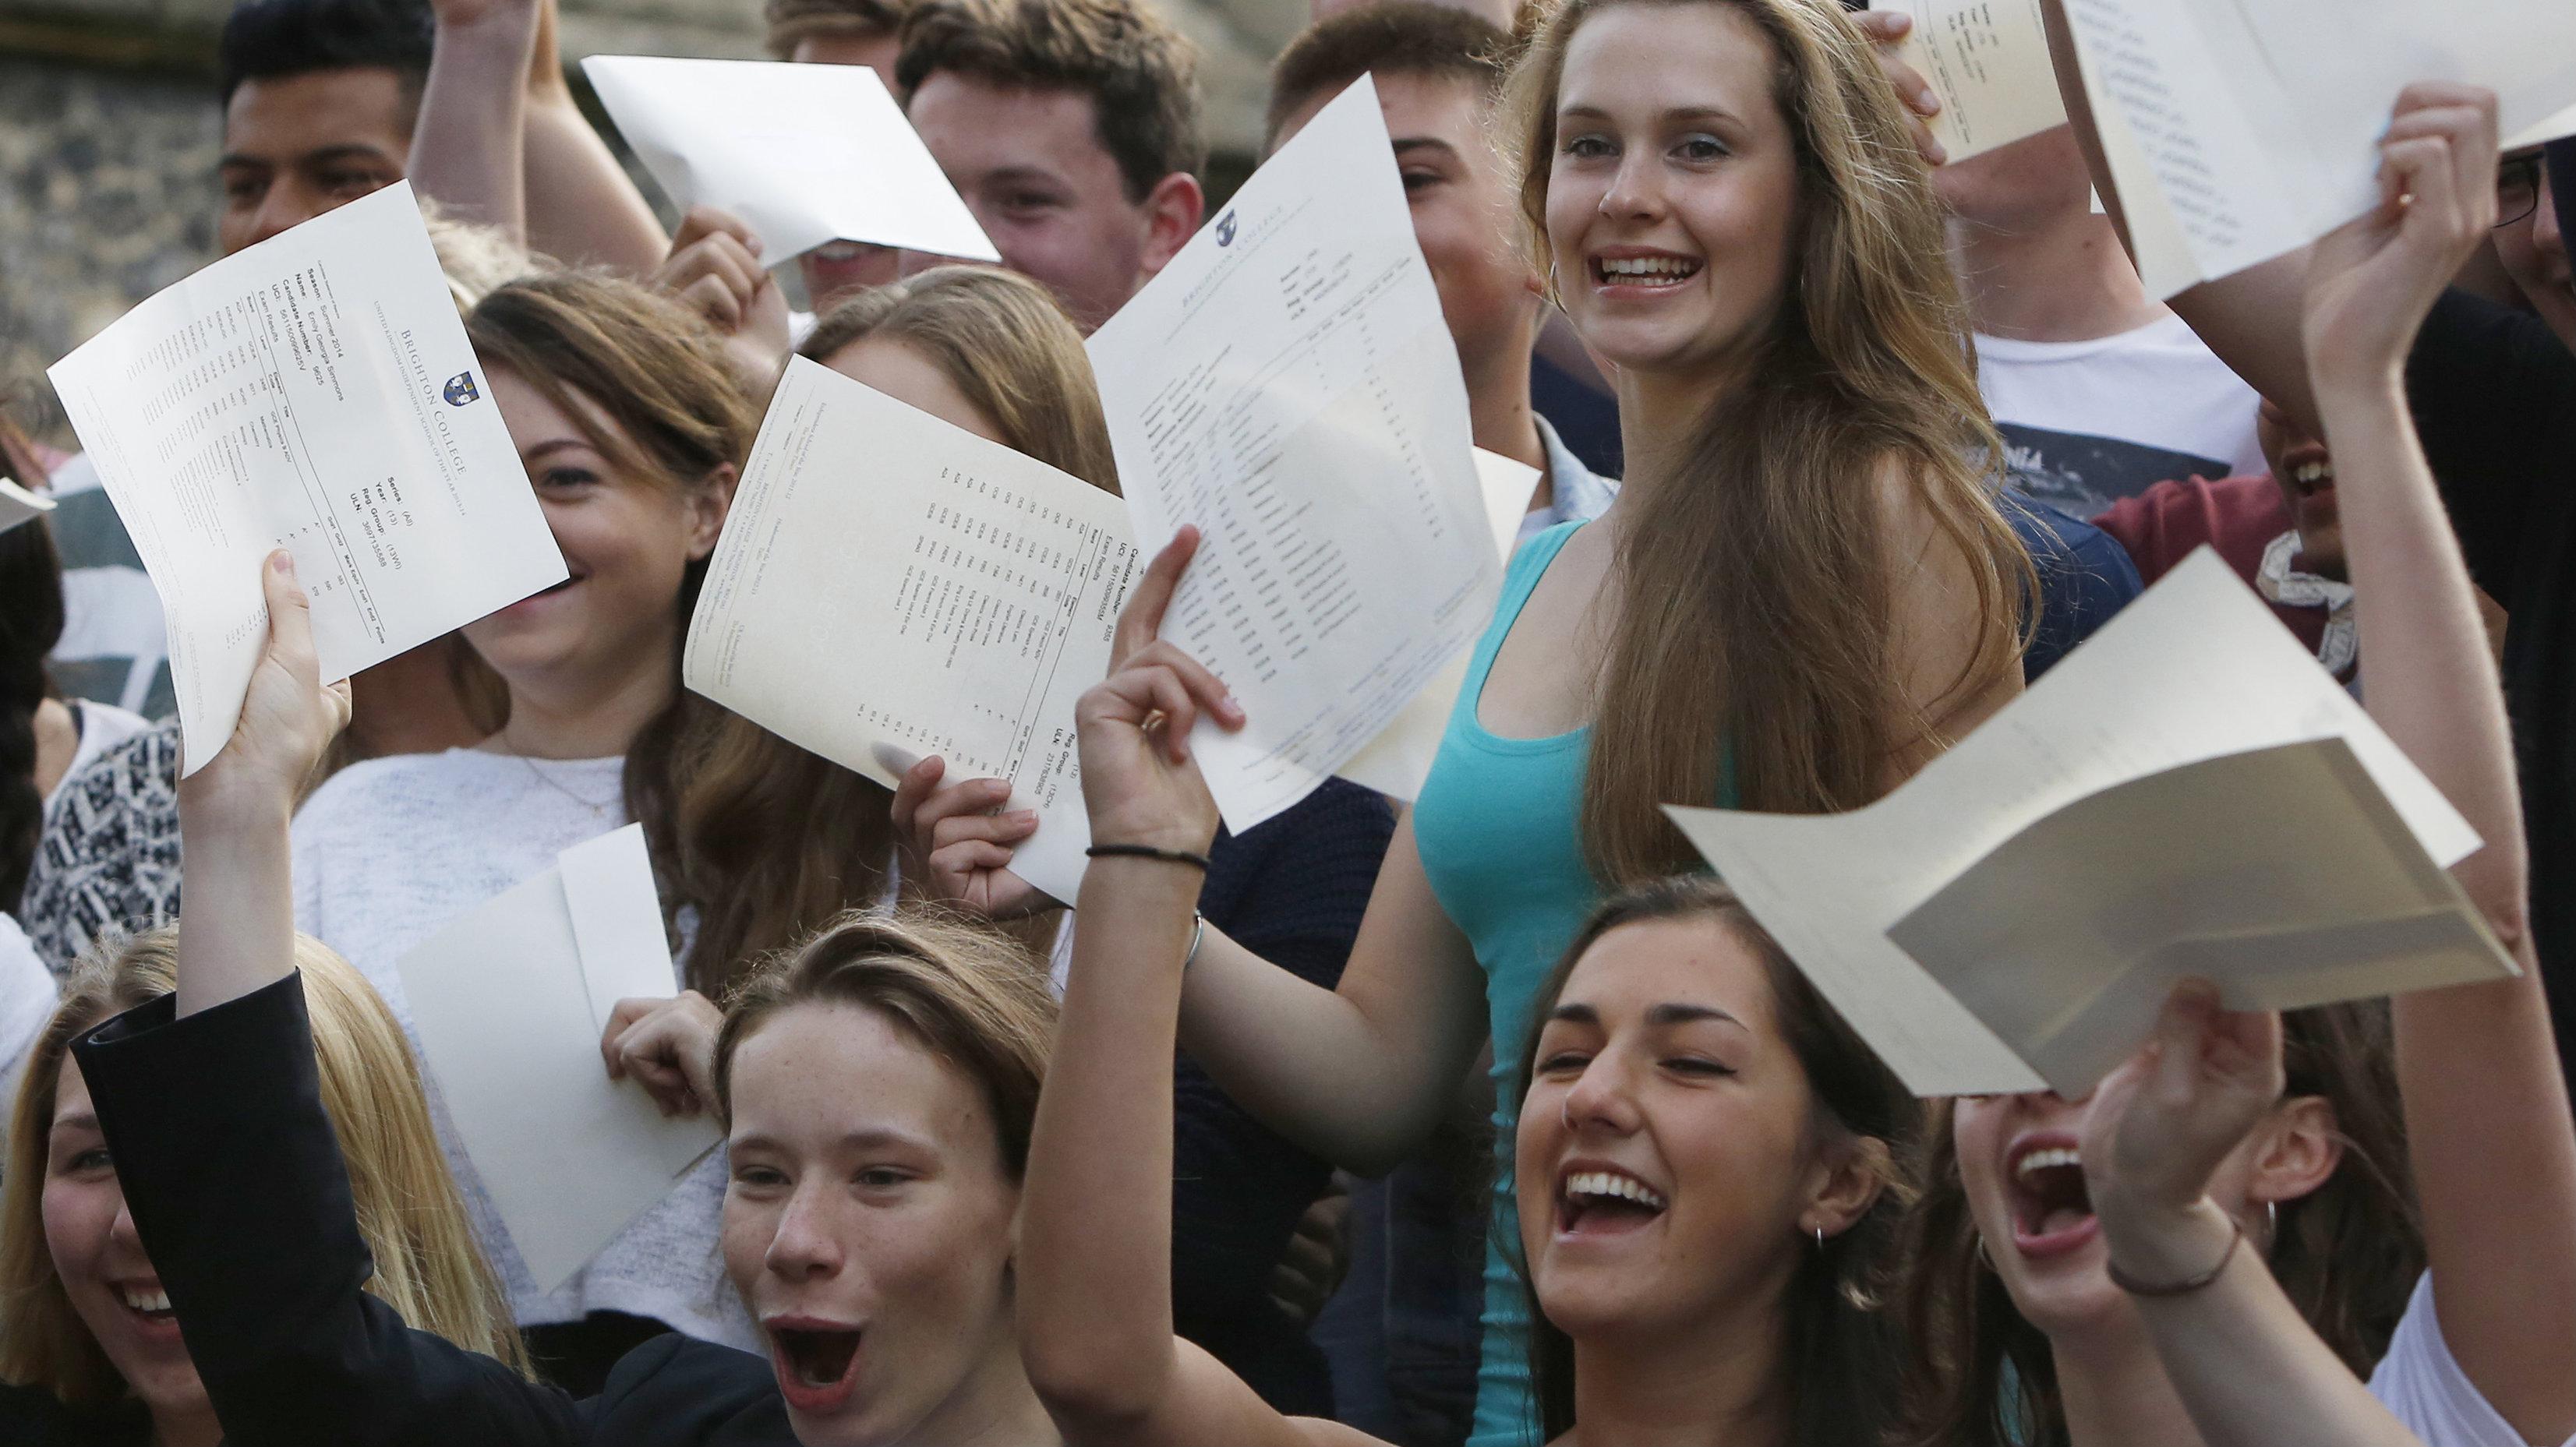 British students showing their grades